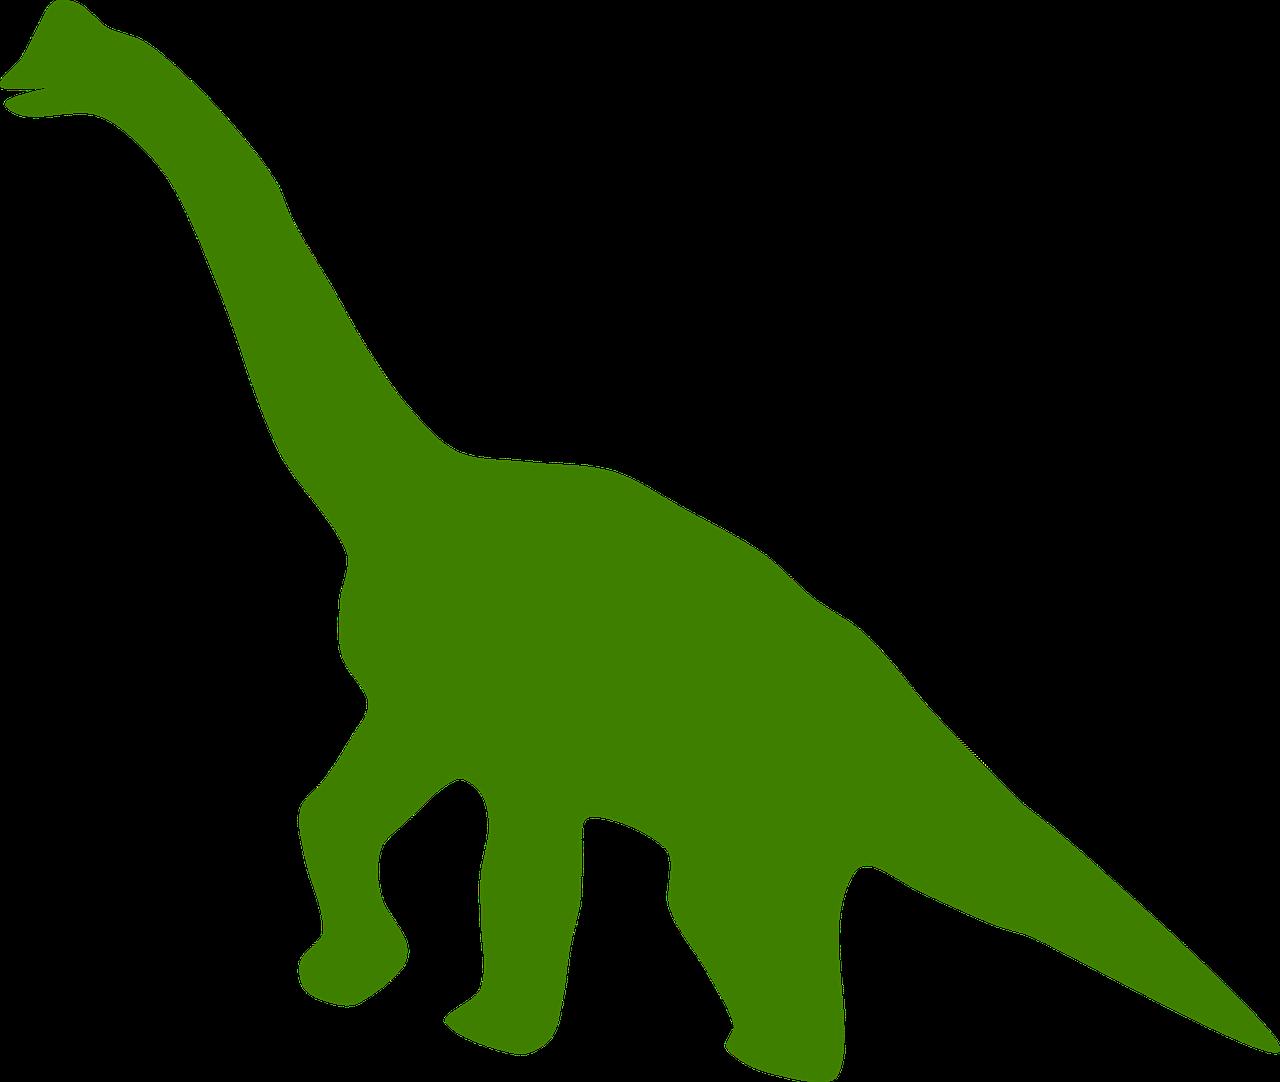 Dinosaurs Svg Dinosaur Outline.